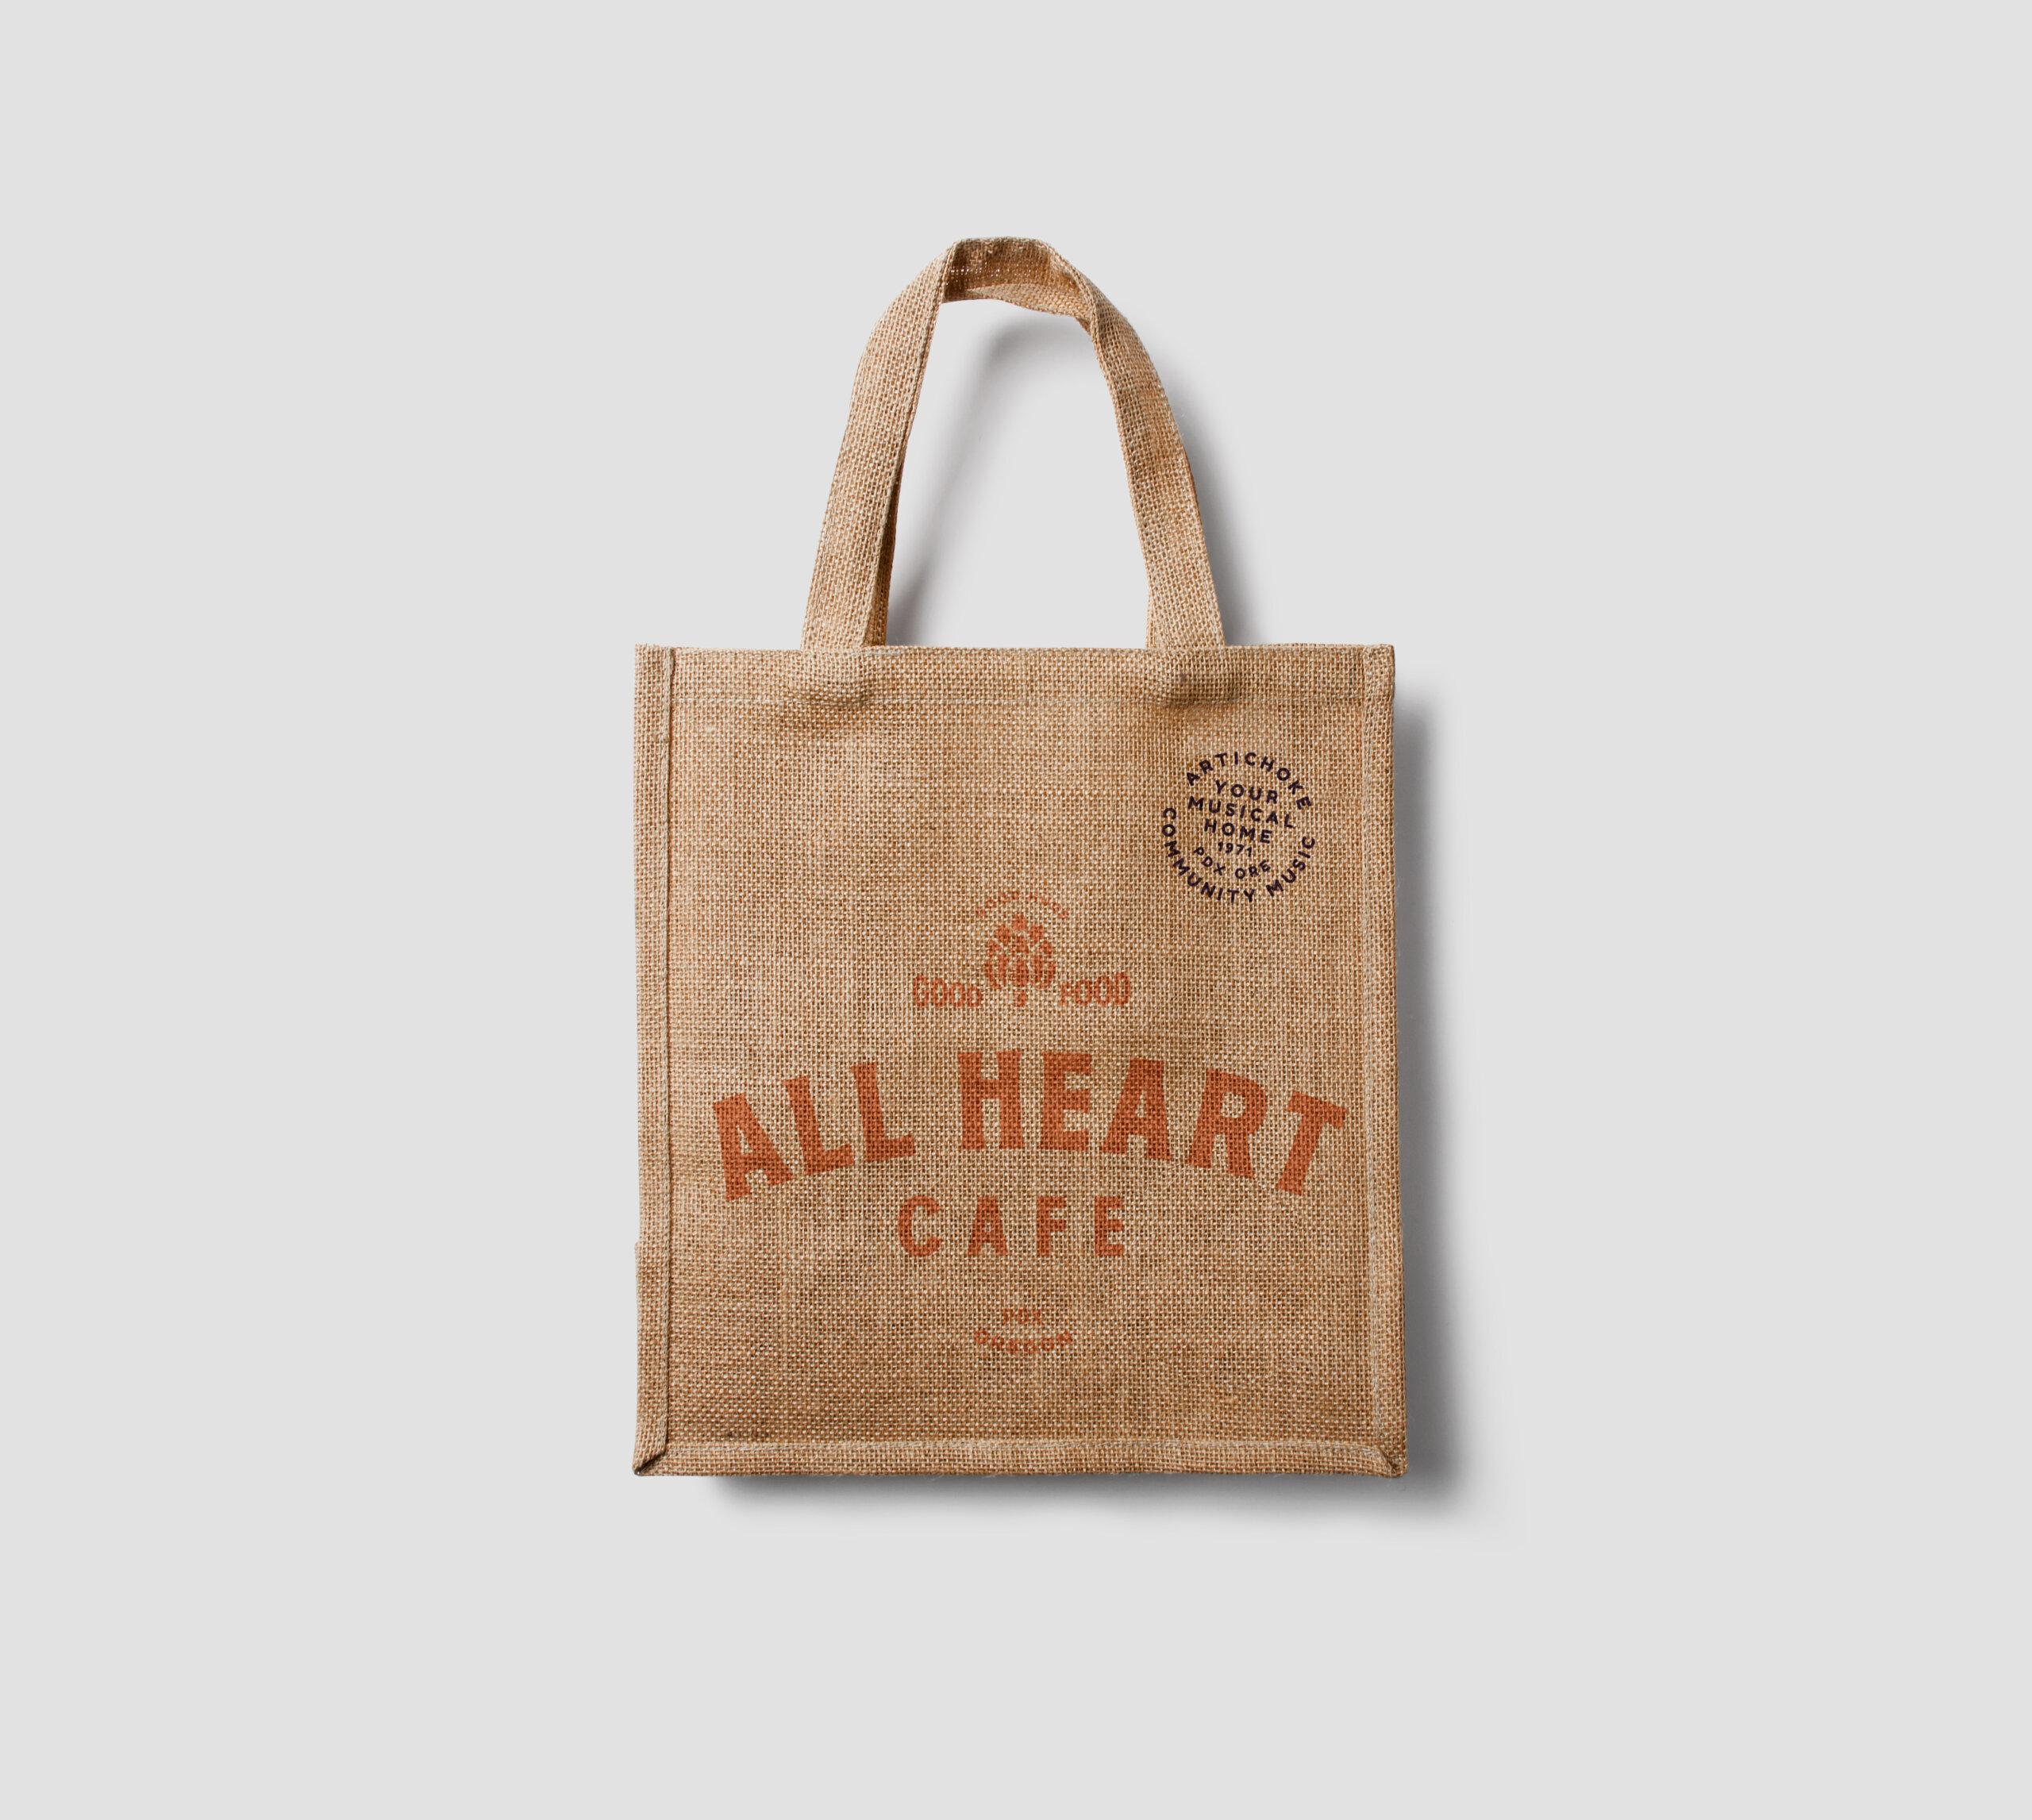 Artichoke Music Tote Bag